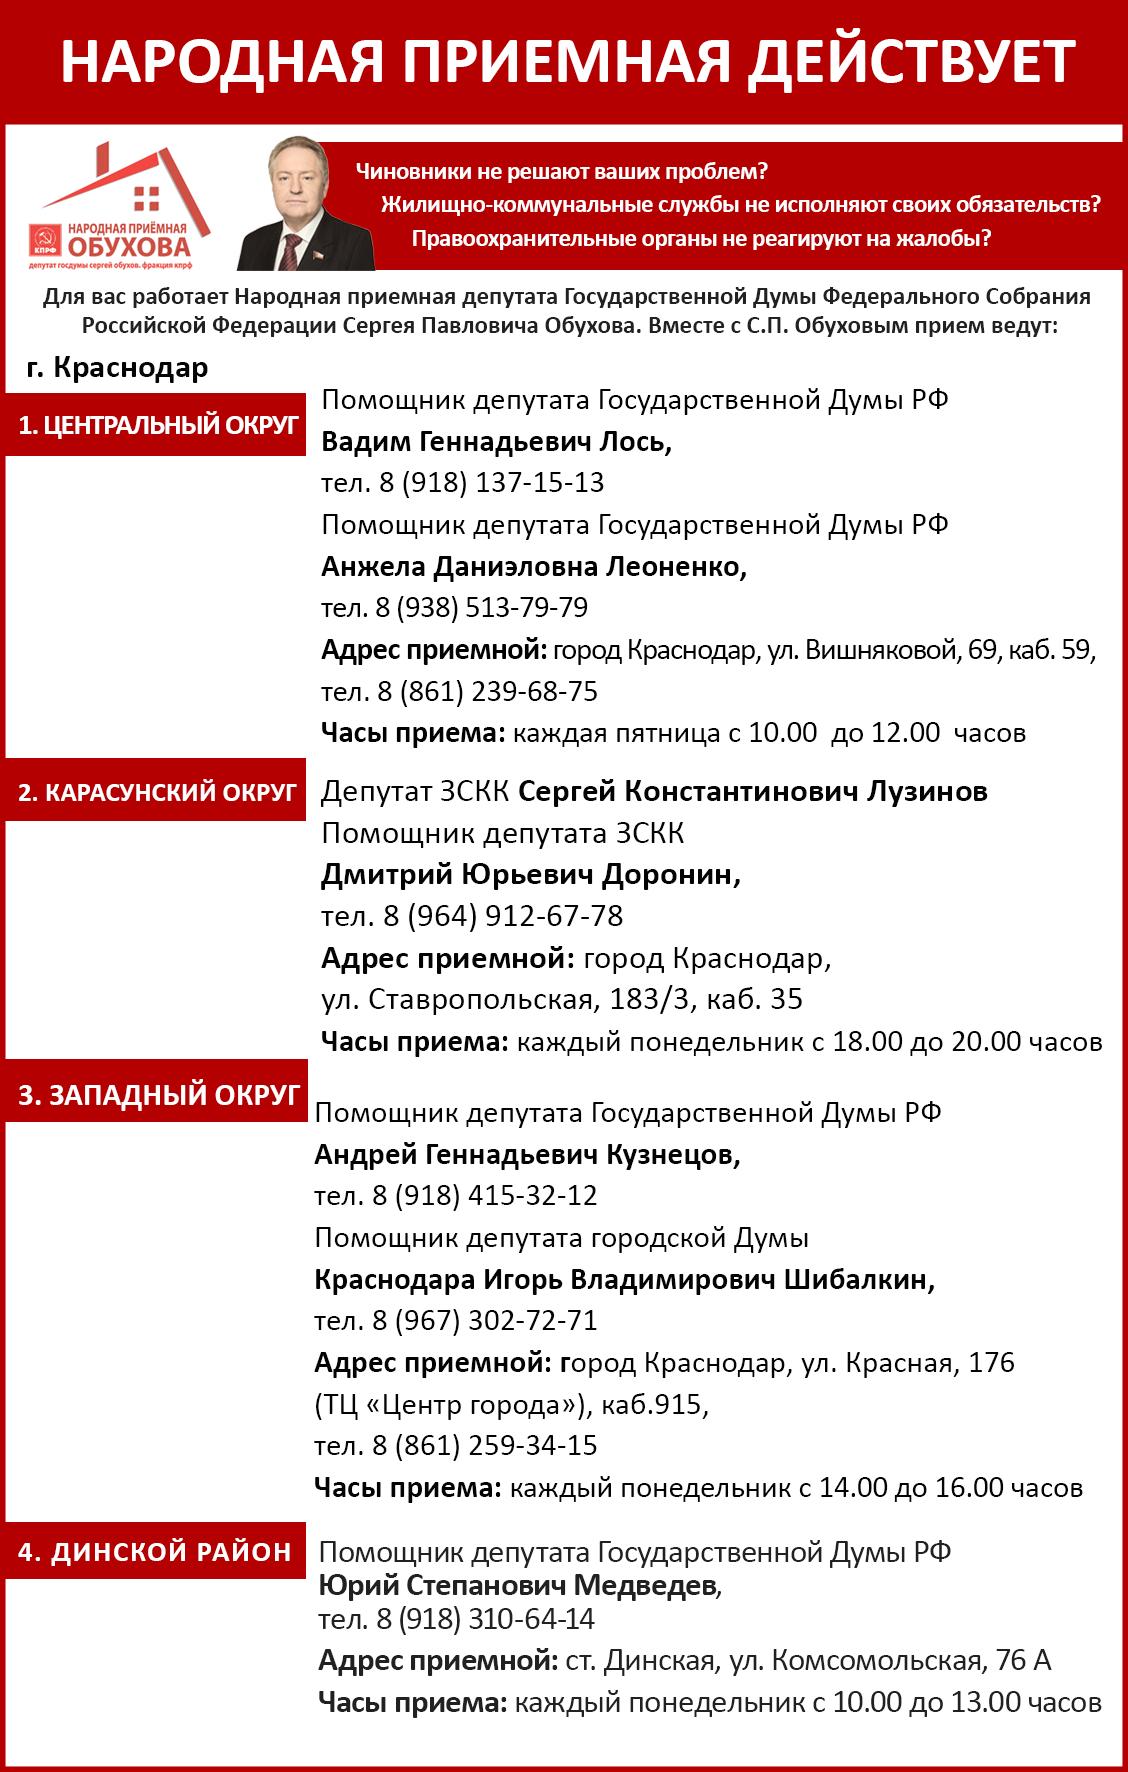 narodnaya_priemnaya_krasnodar